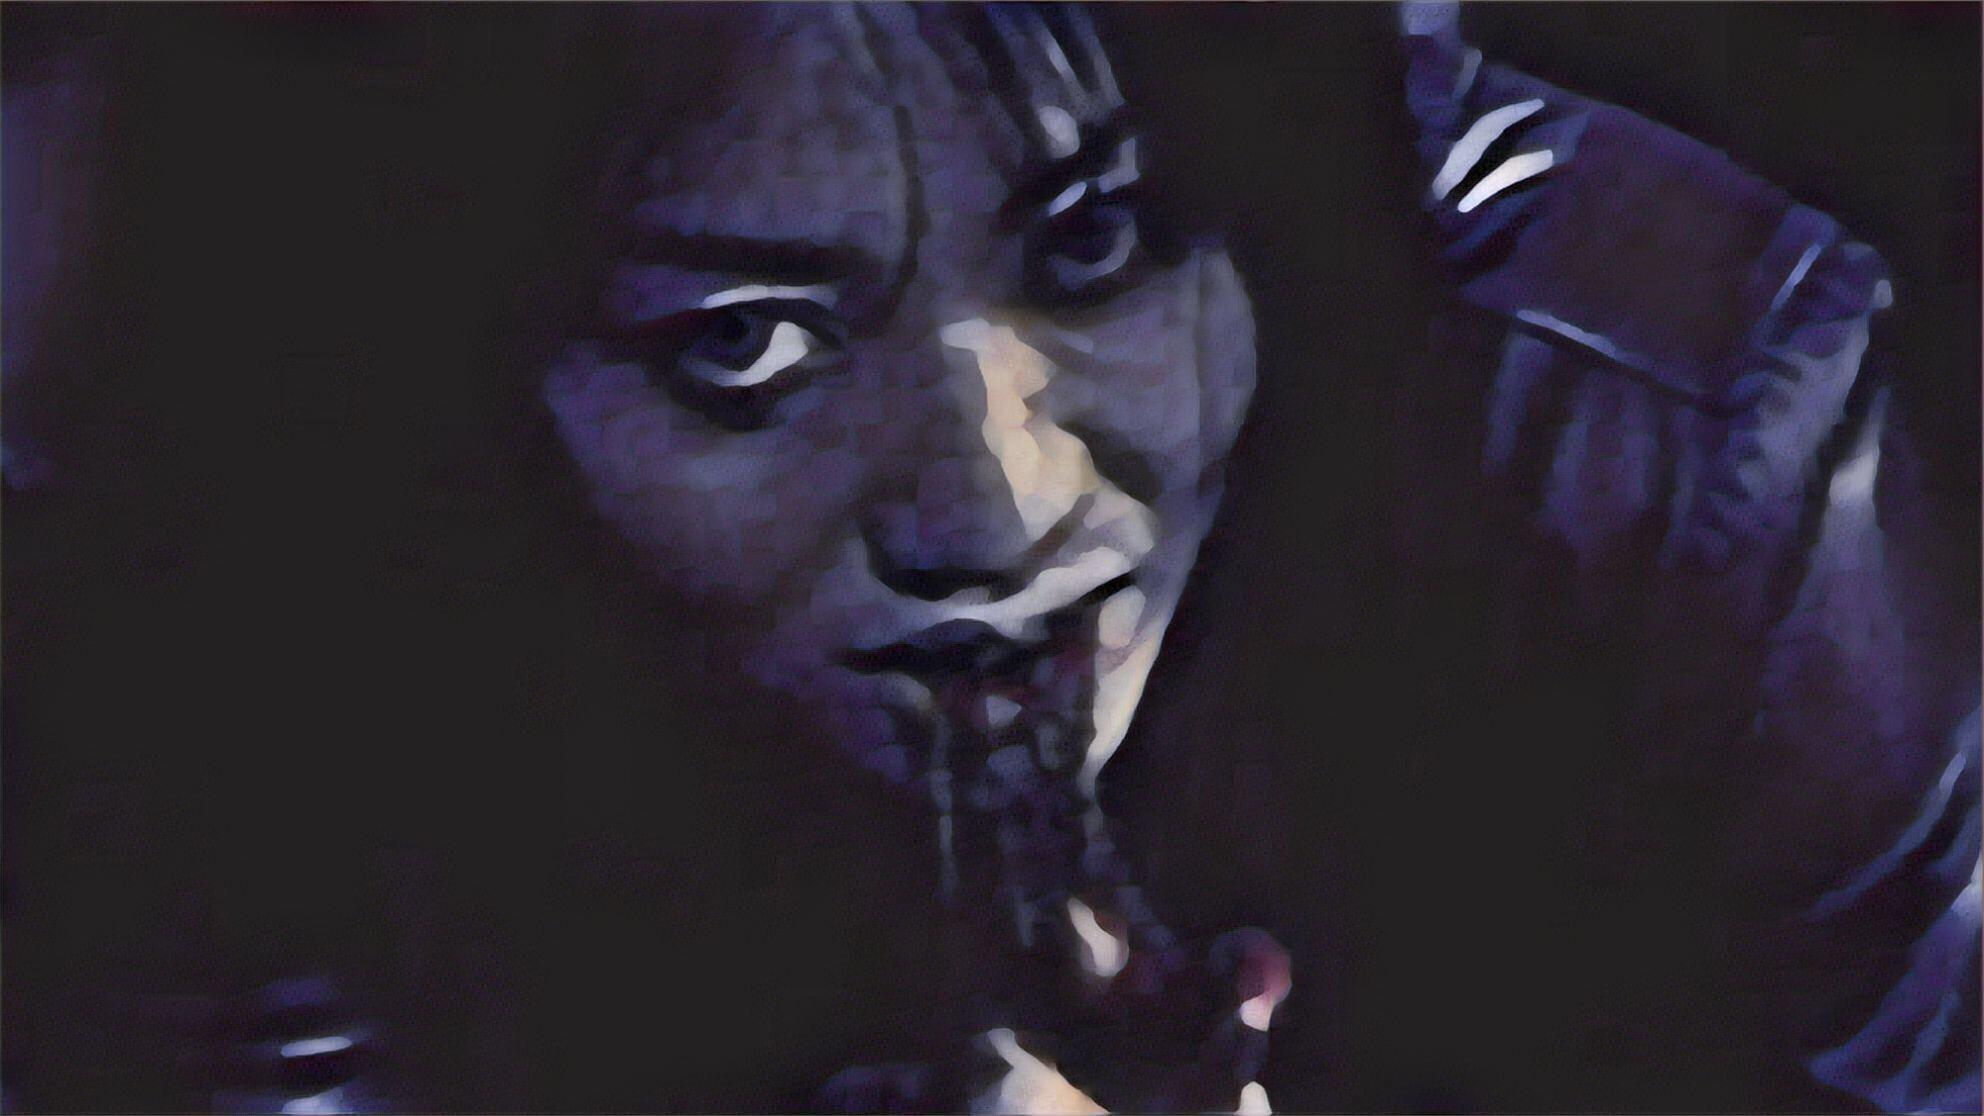 Junk-2000-movie-Asian-zombie-1.jpg